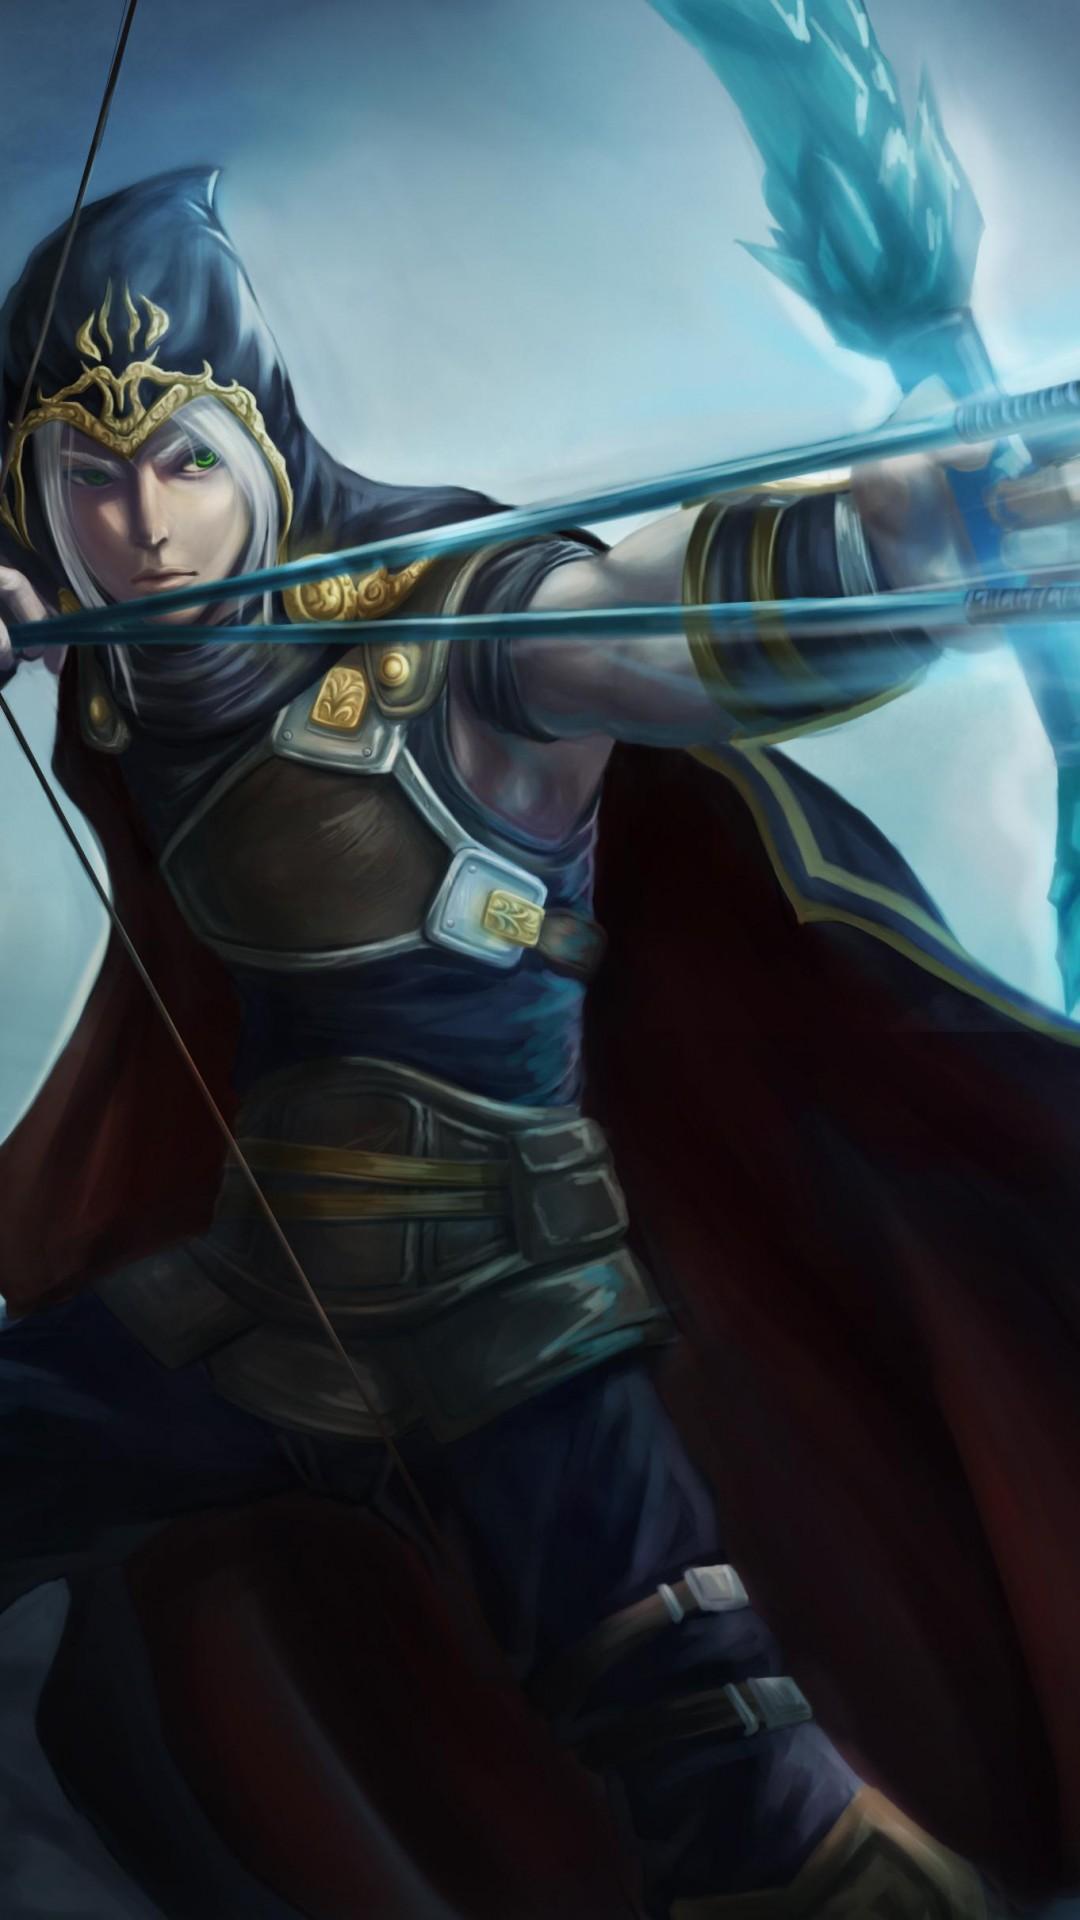 Wallpaper League Of Legends Game Lol Moba Archer